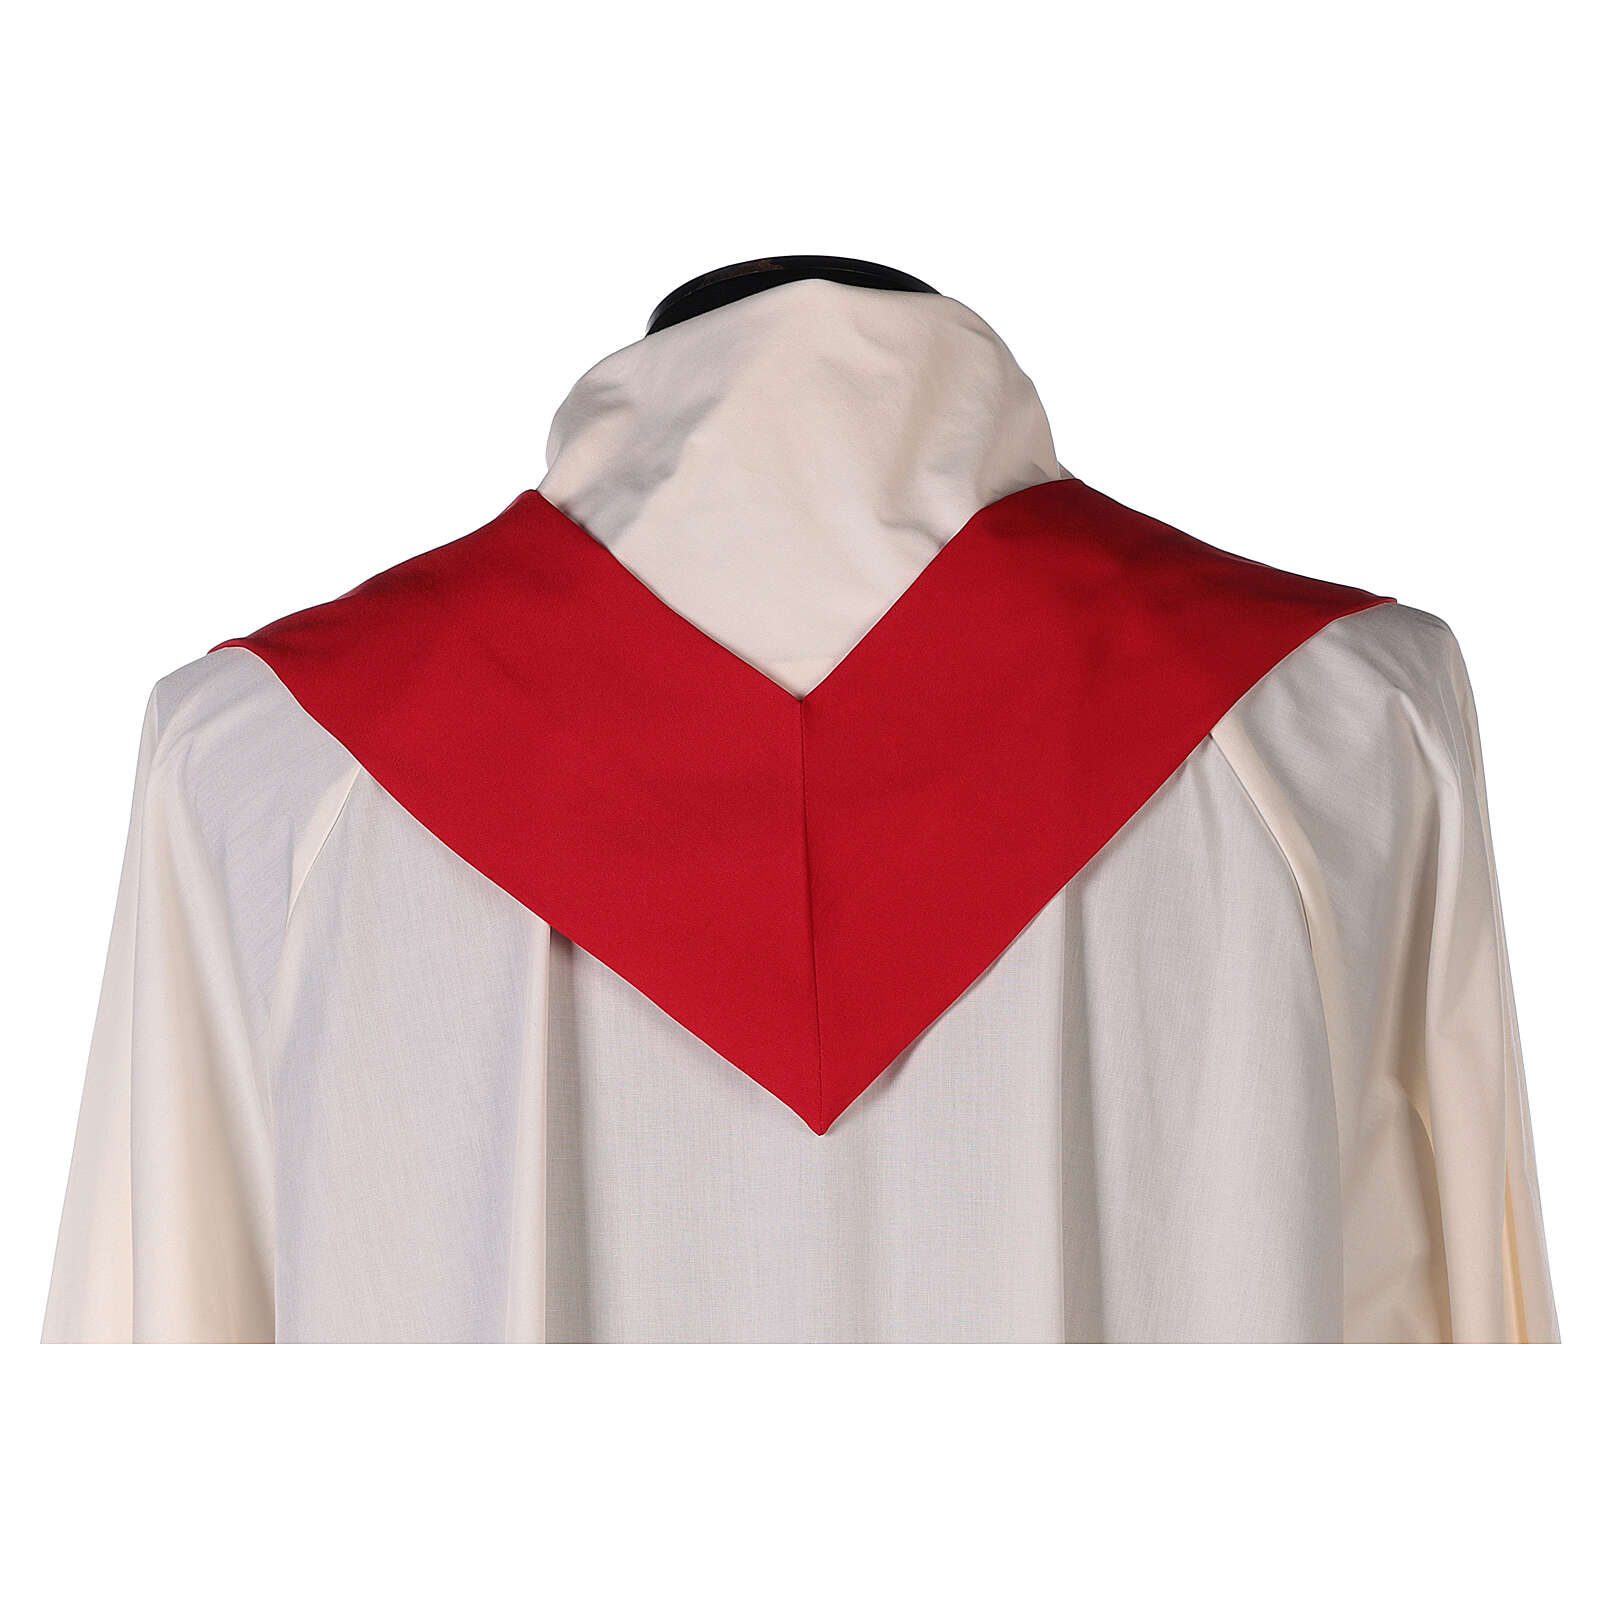 Conjunto 4 casulas litúrgicas poliéter 4 cores bordado cruz decorada SUPER BARATO 4